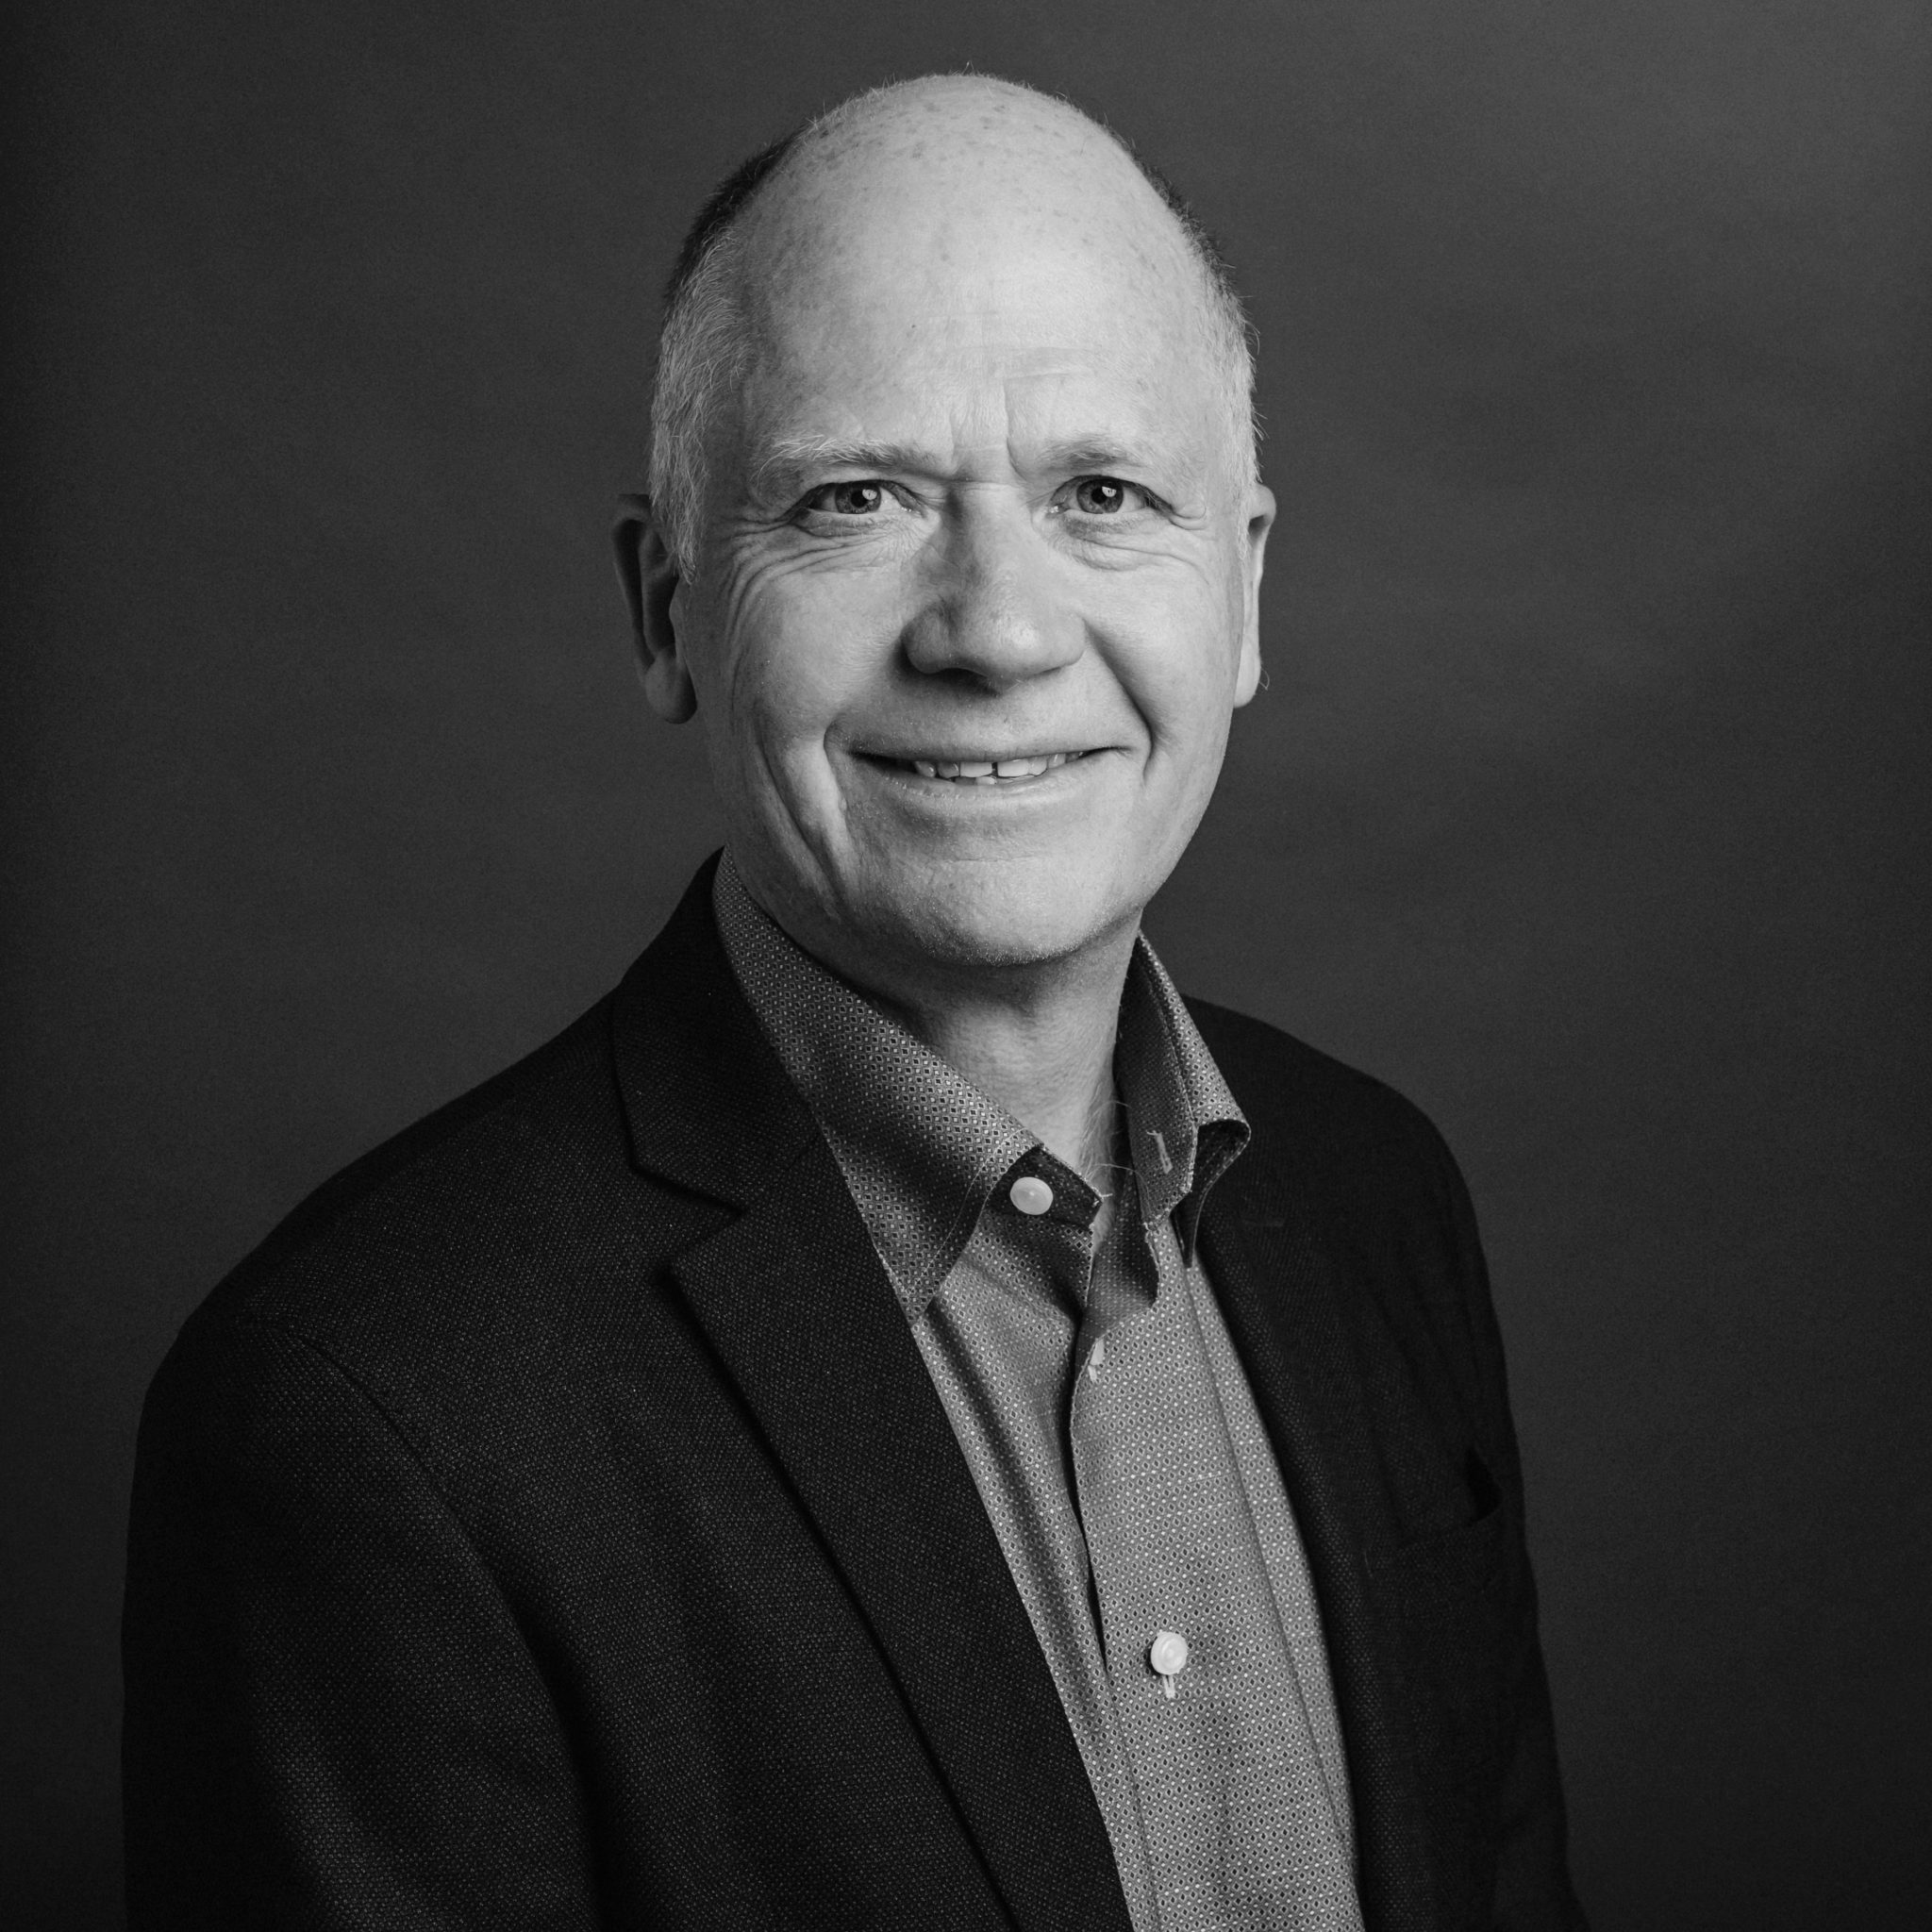 Fredrik Wadström